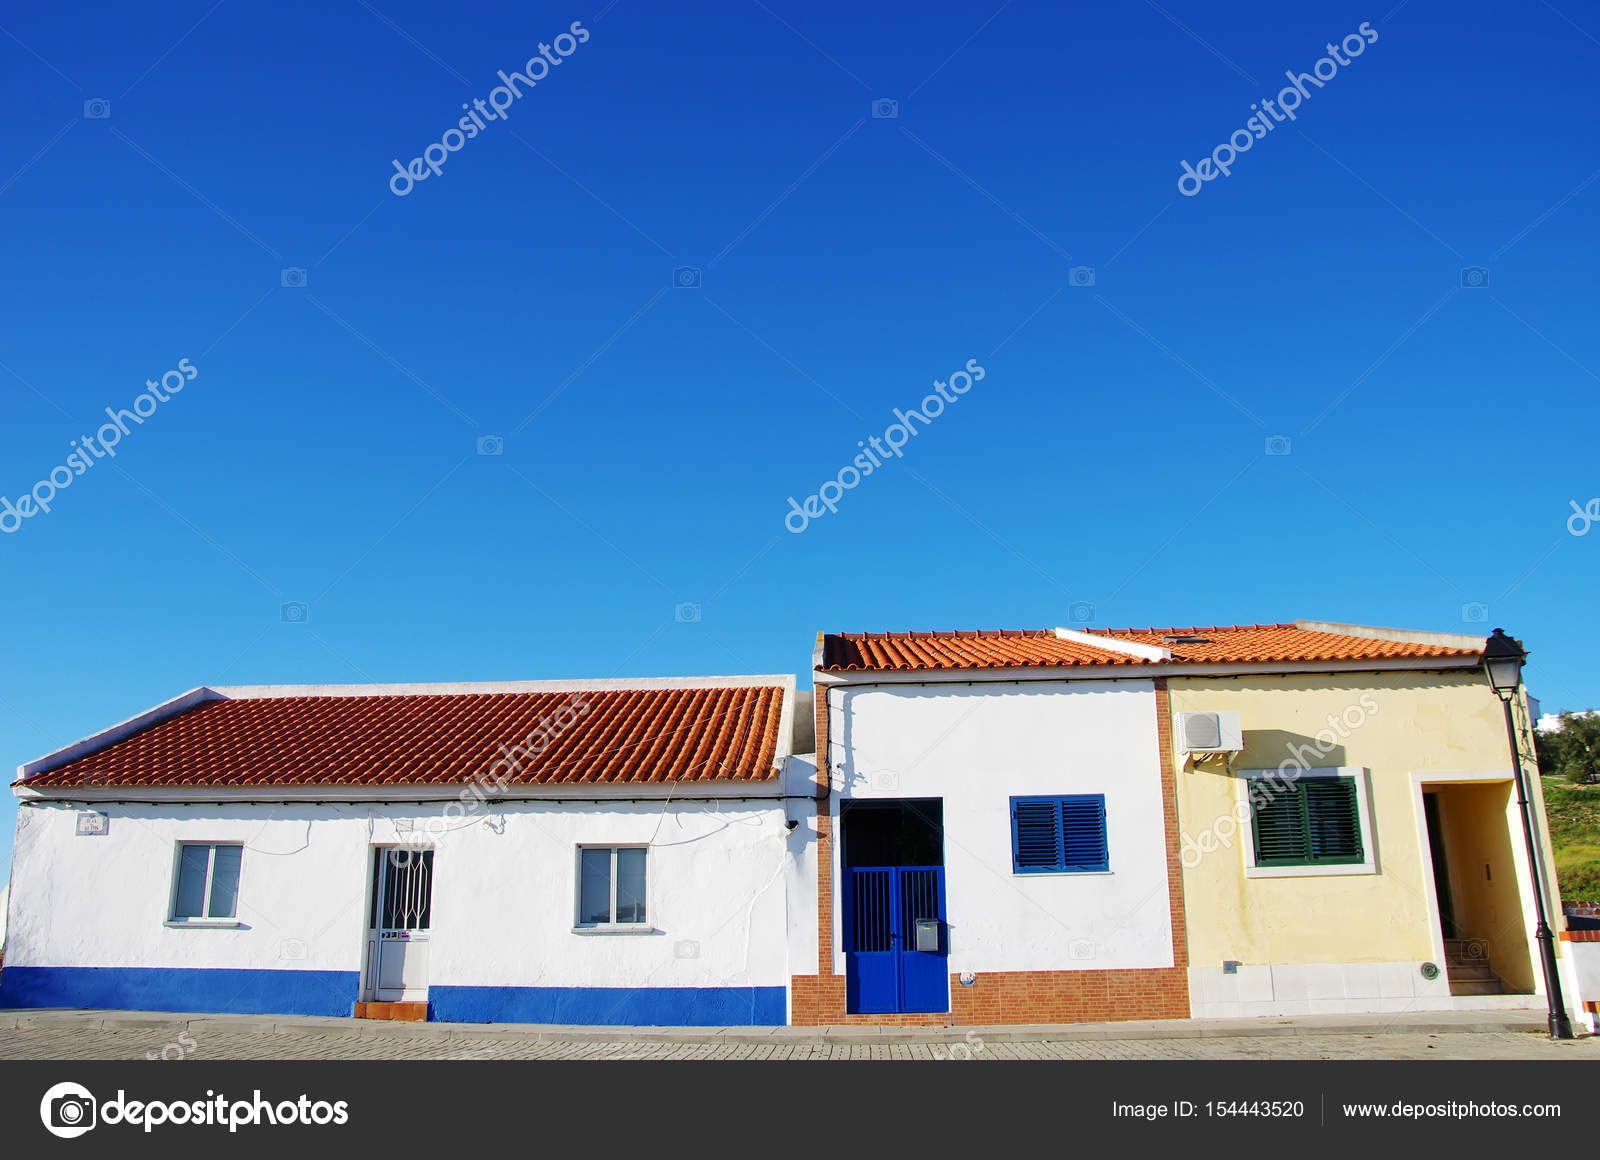 typische h user portugal alentejo region stockfoto inaquim 154443520. Black Bedroom Furniture Sets. Home Design Ideas